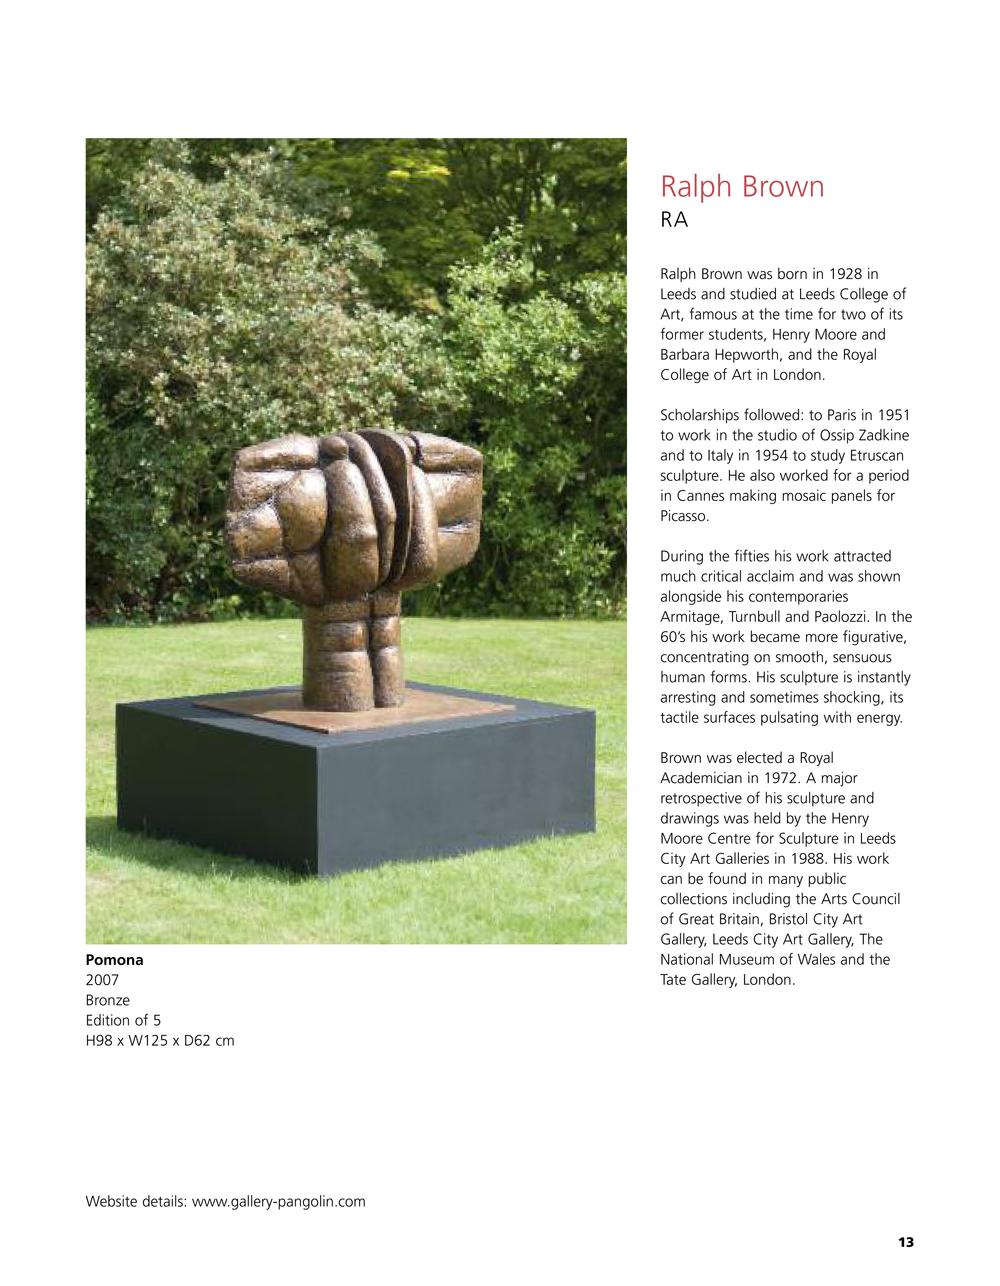 sculpturebooklet 2010 Leicester-13.jpg